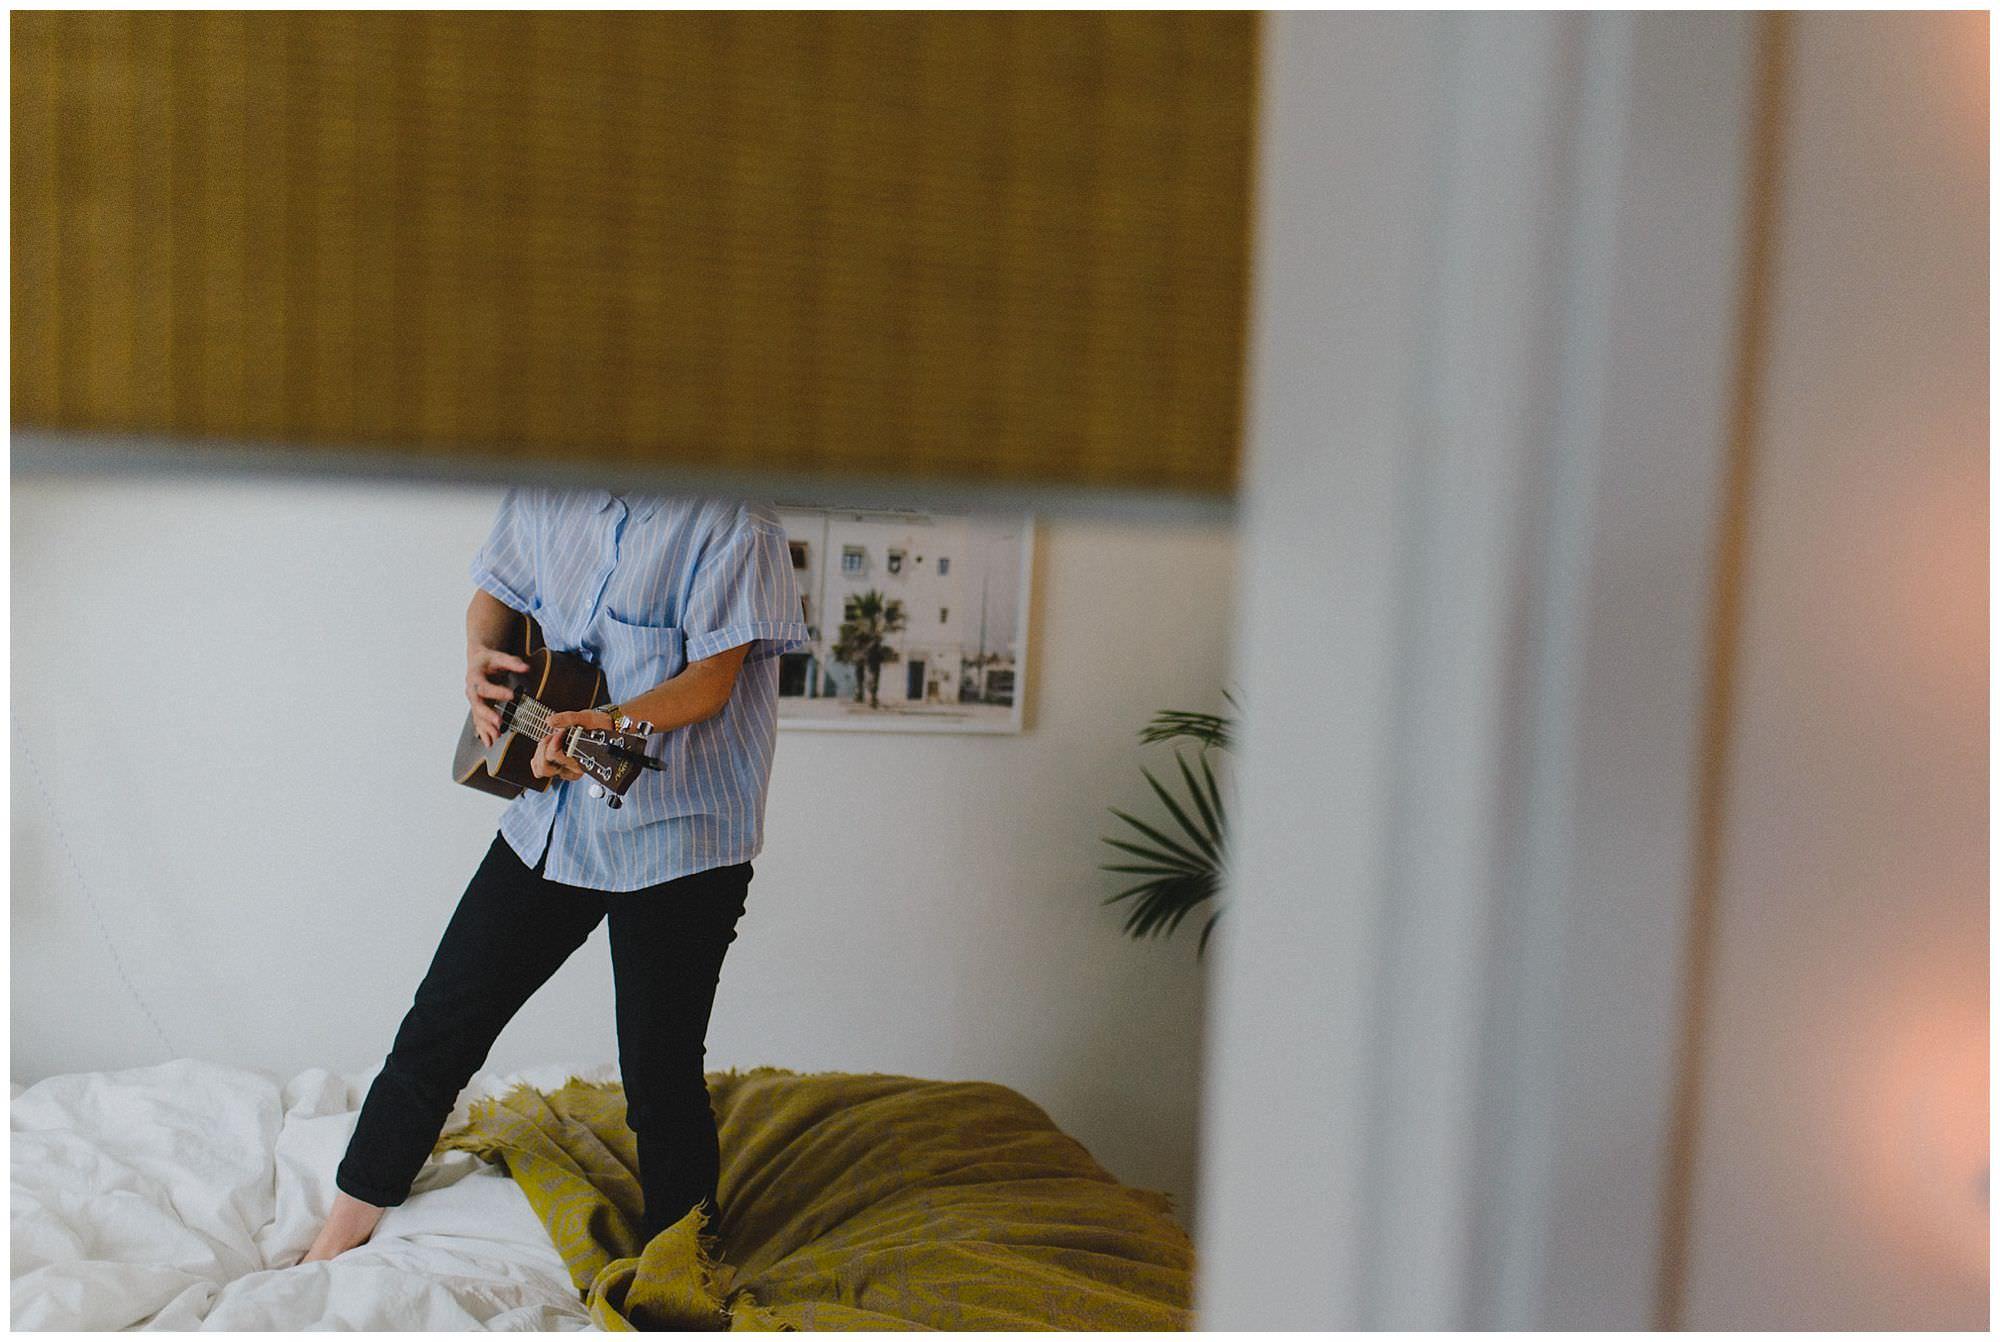 Musician Jody Mariko Okabe plays ukulele during in-home candid portrait photo session